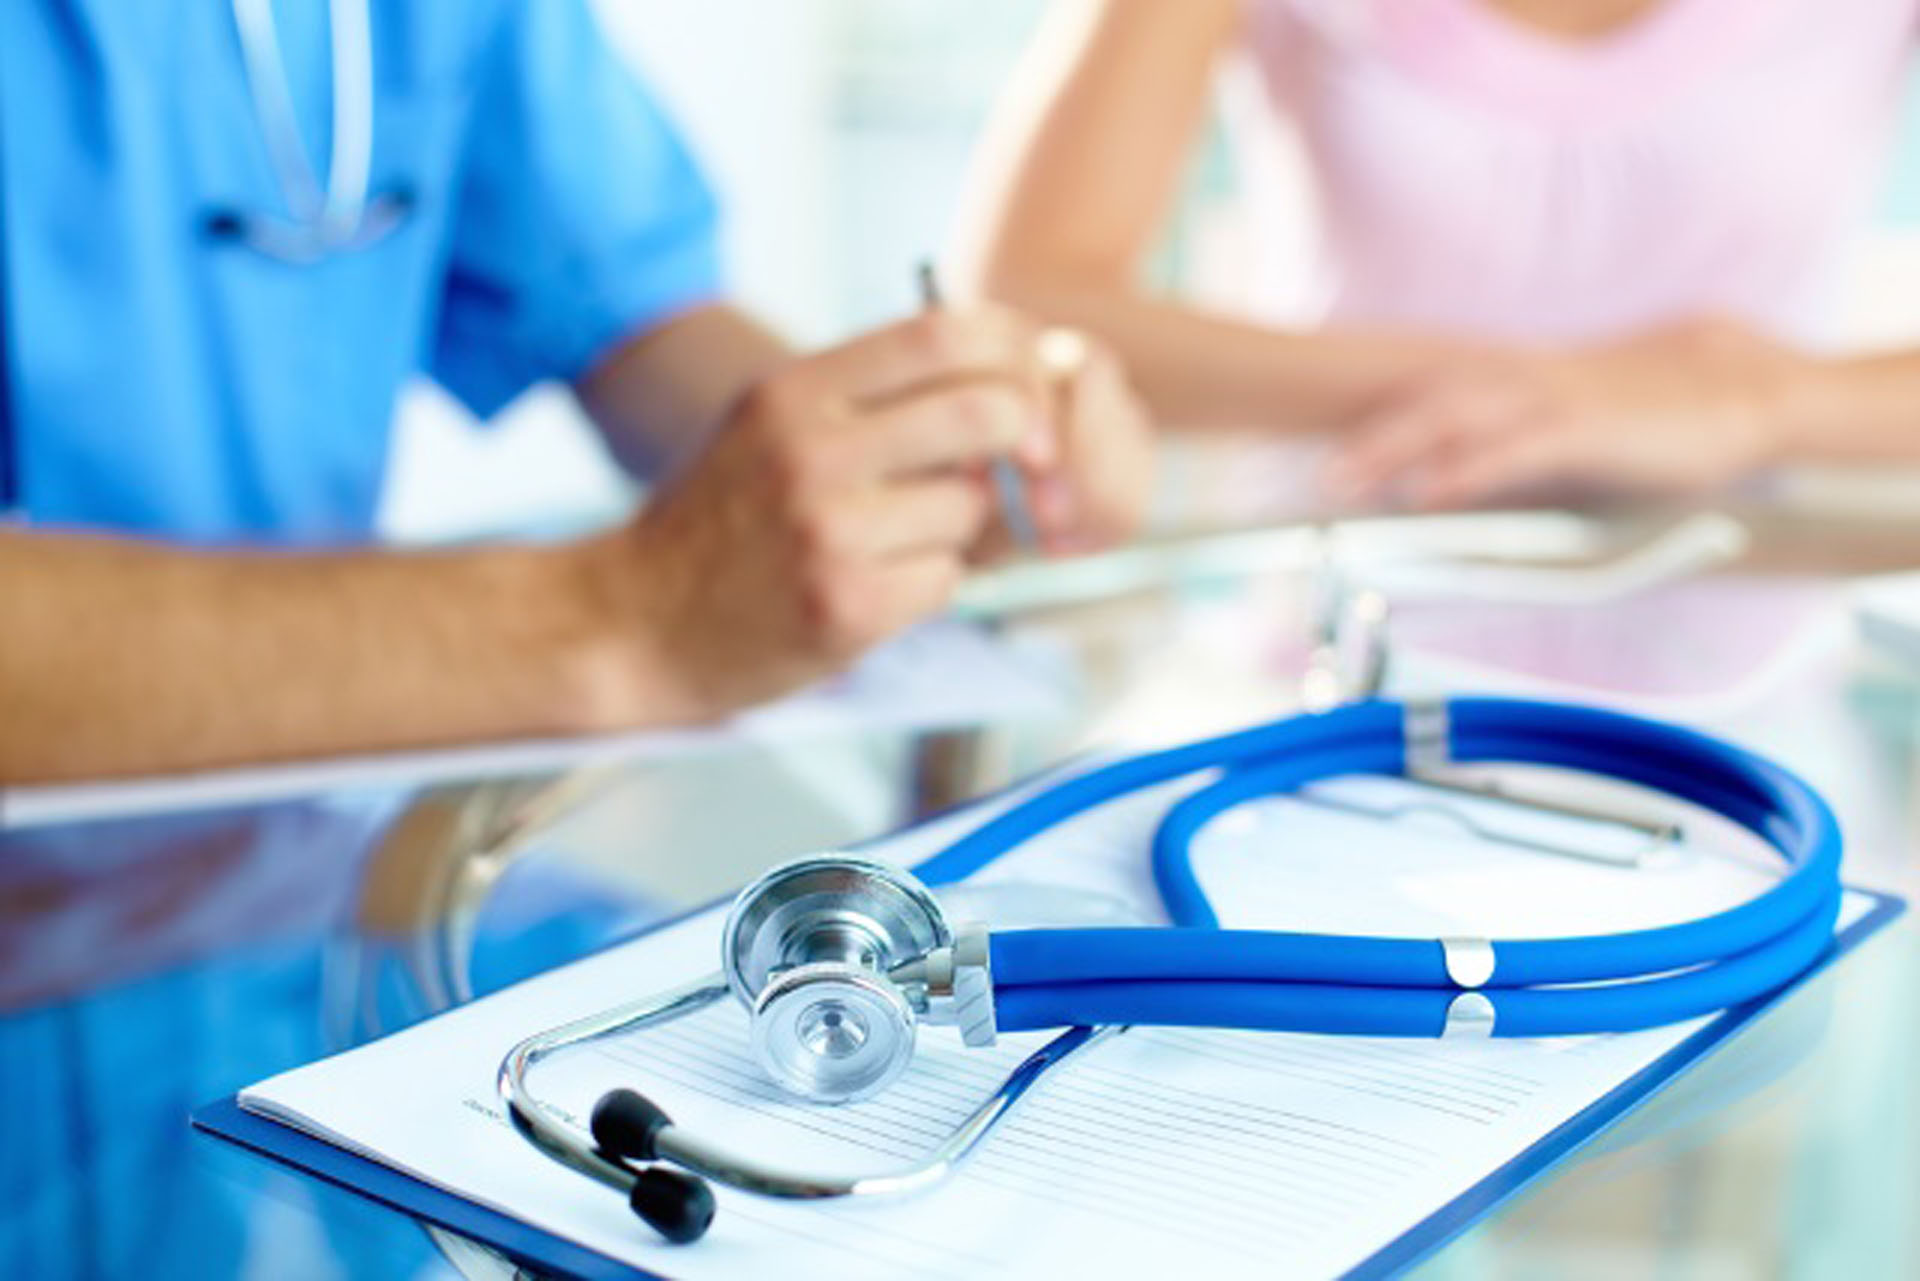 doctor-hospital-medical-patient-generic-stethescope_1522256326897.jpg